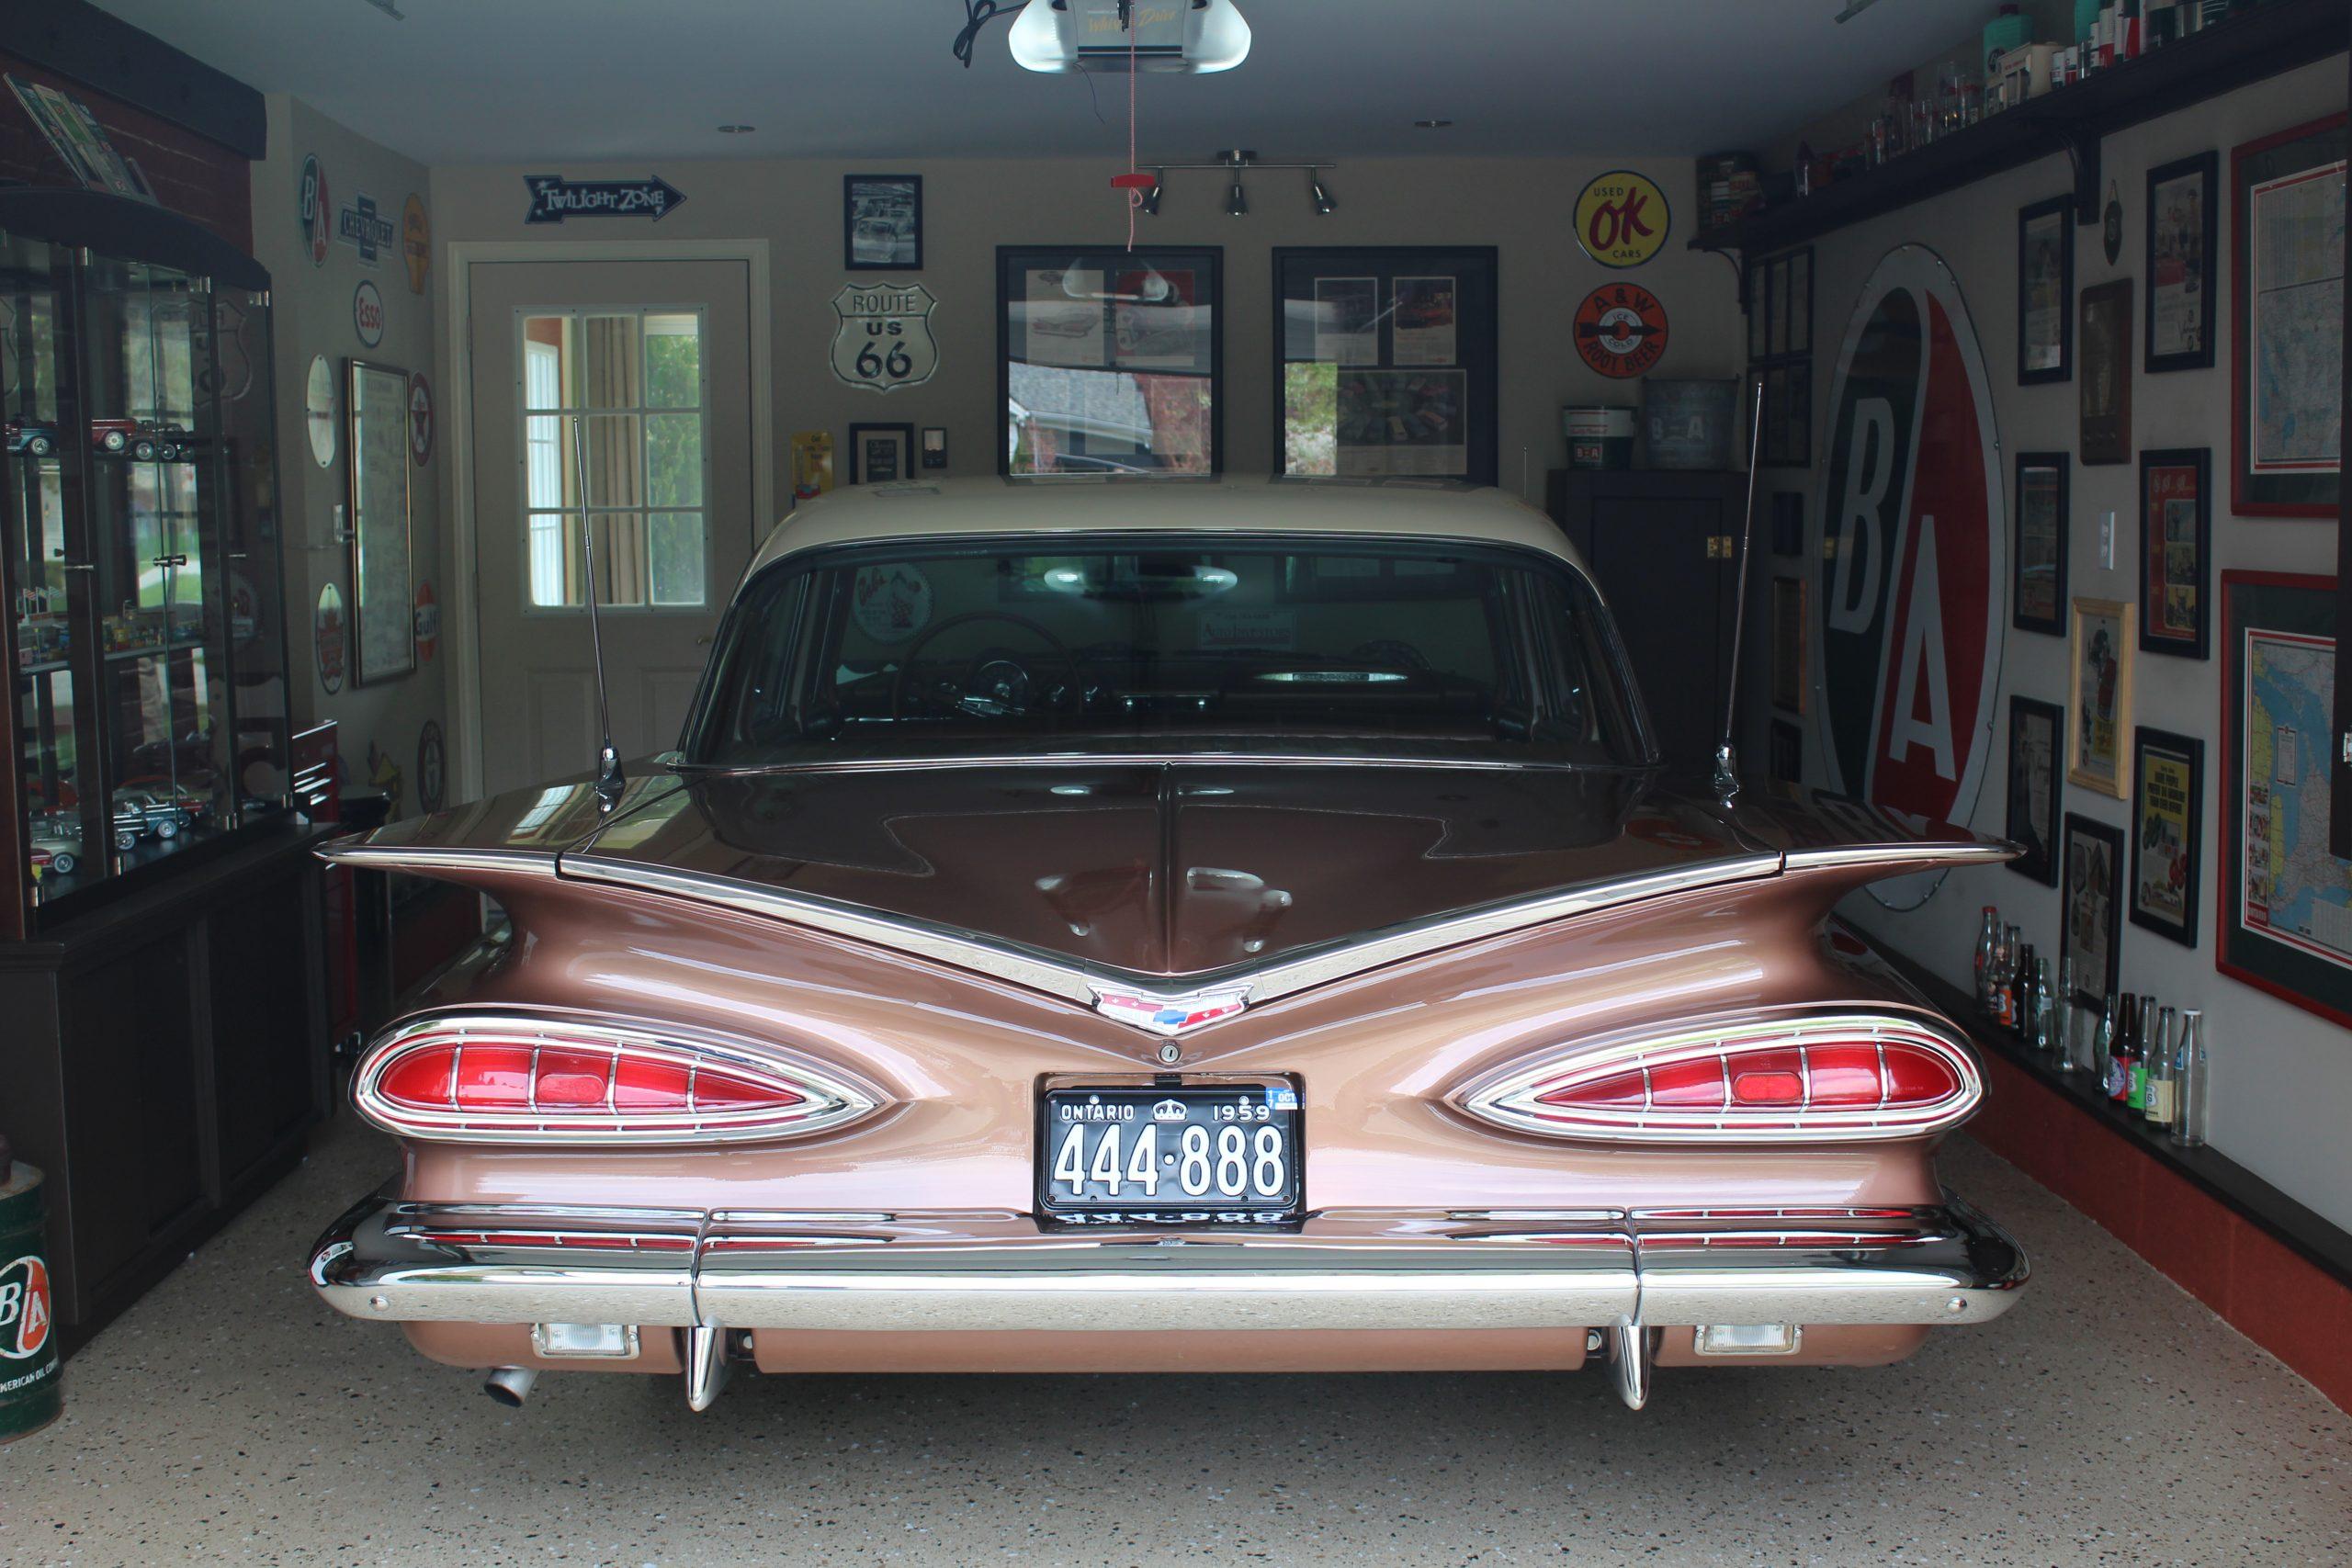 1959 Chevrolet Bel Air rear garage